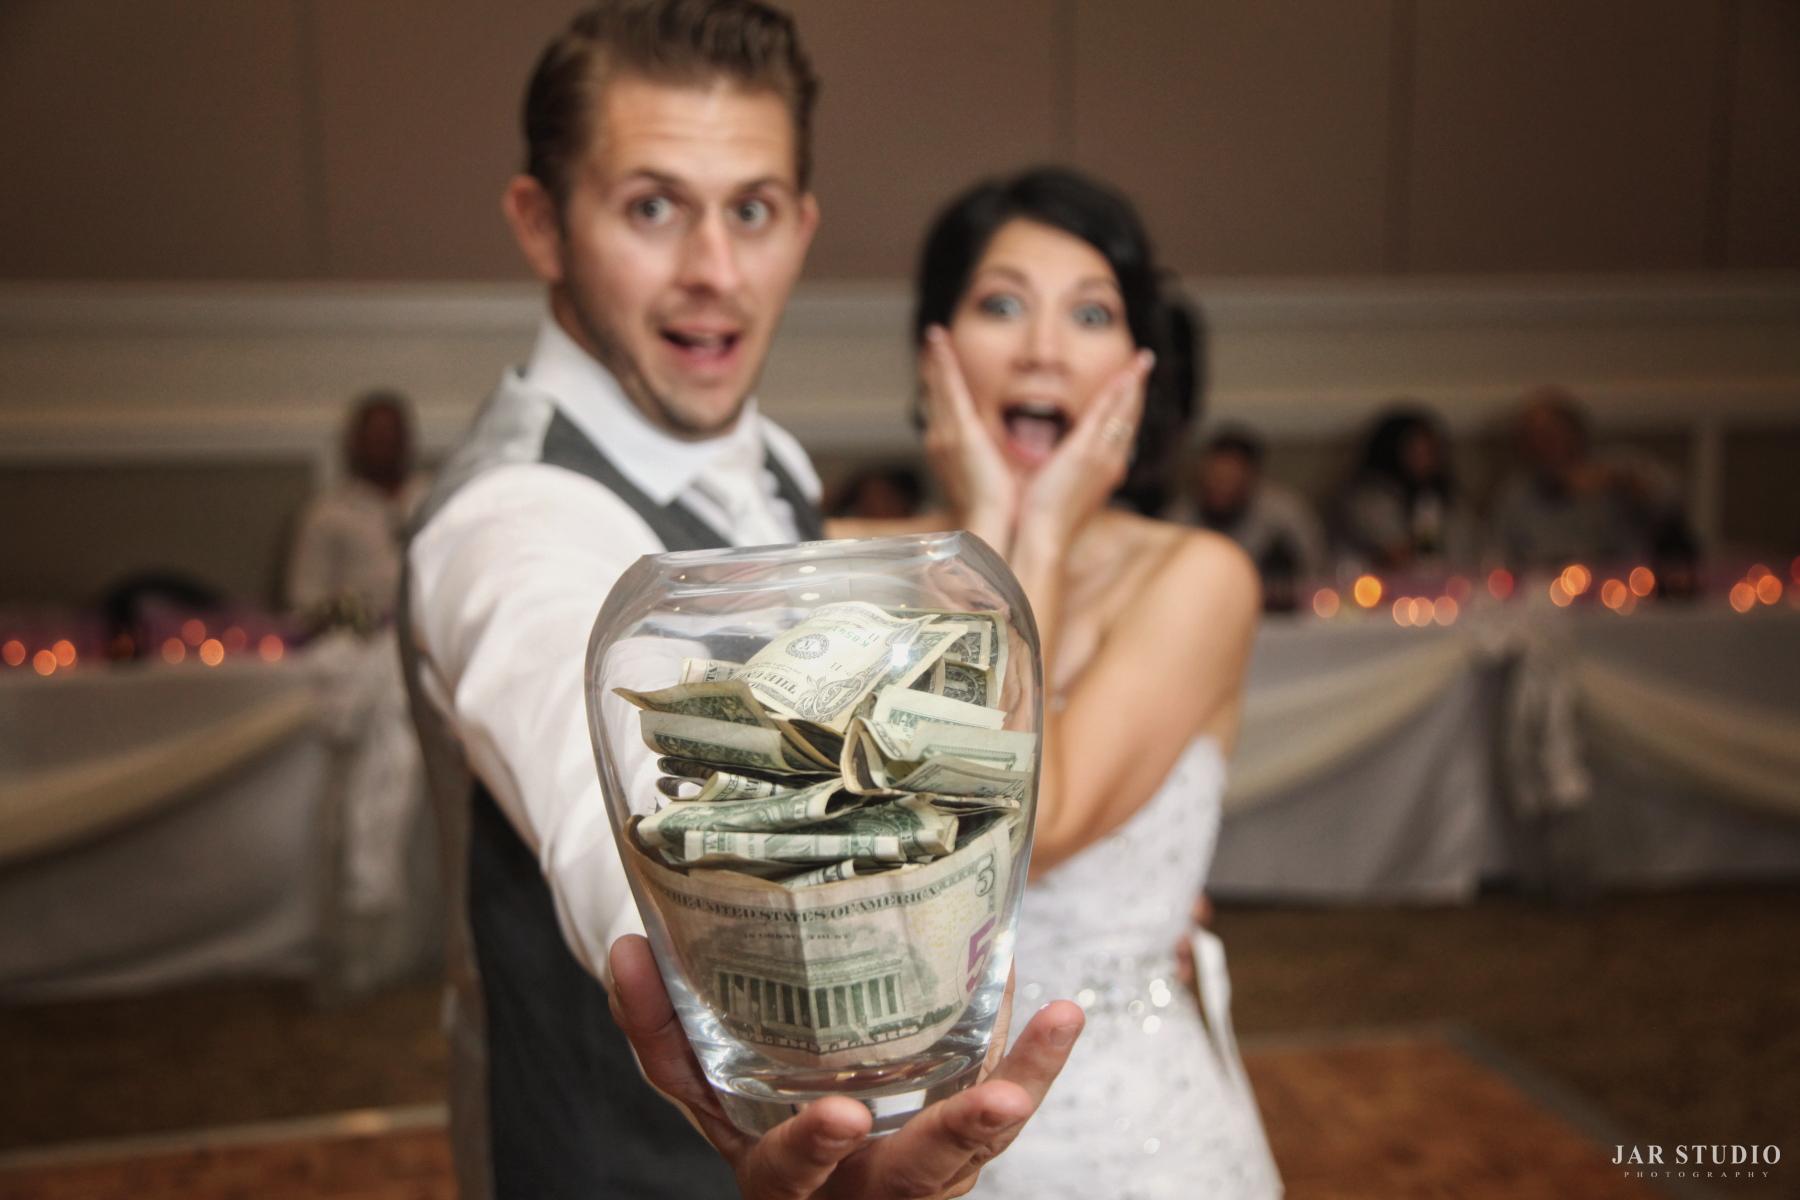 z-Lakeshore-Center-wedding-photographer-jarstudio (4).JPG